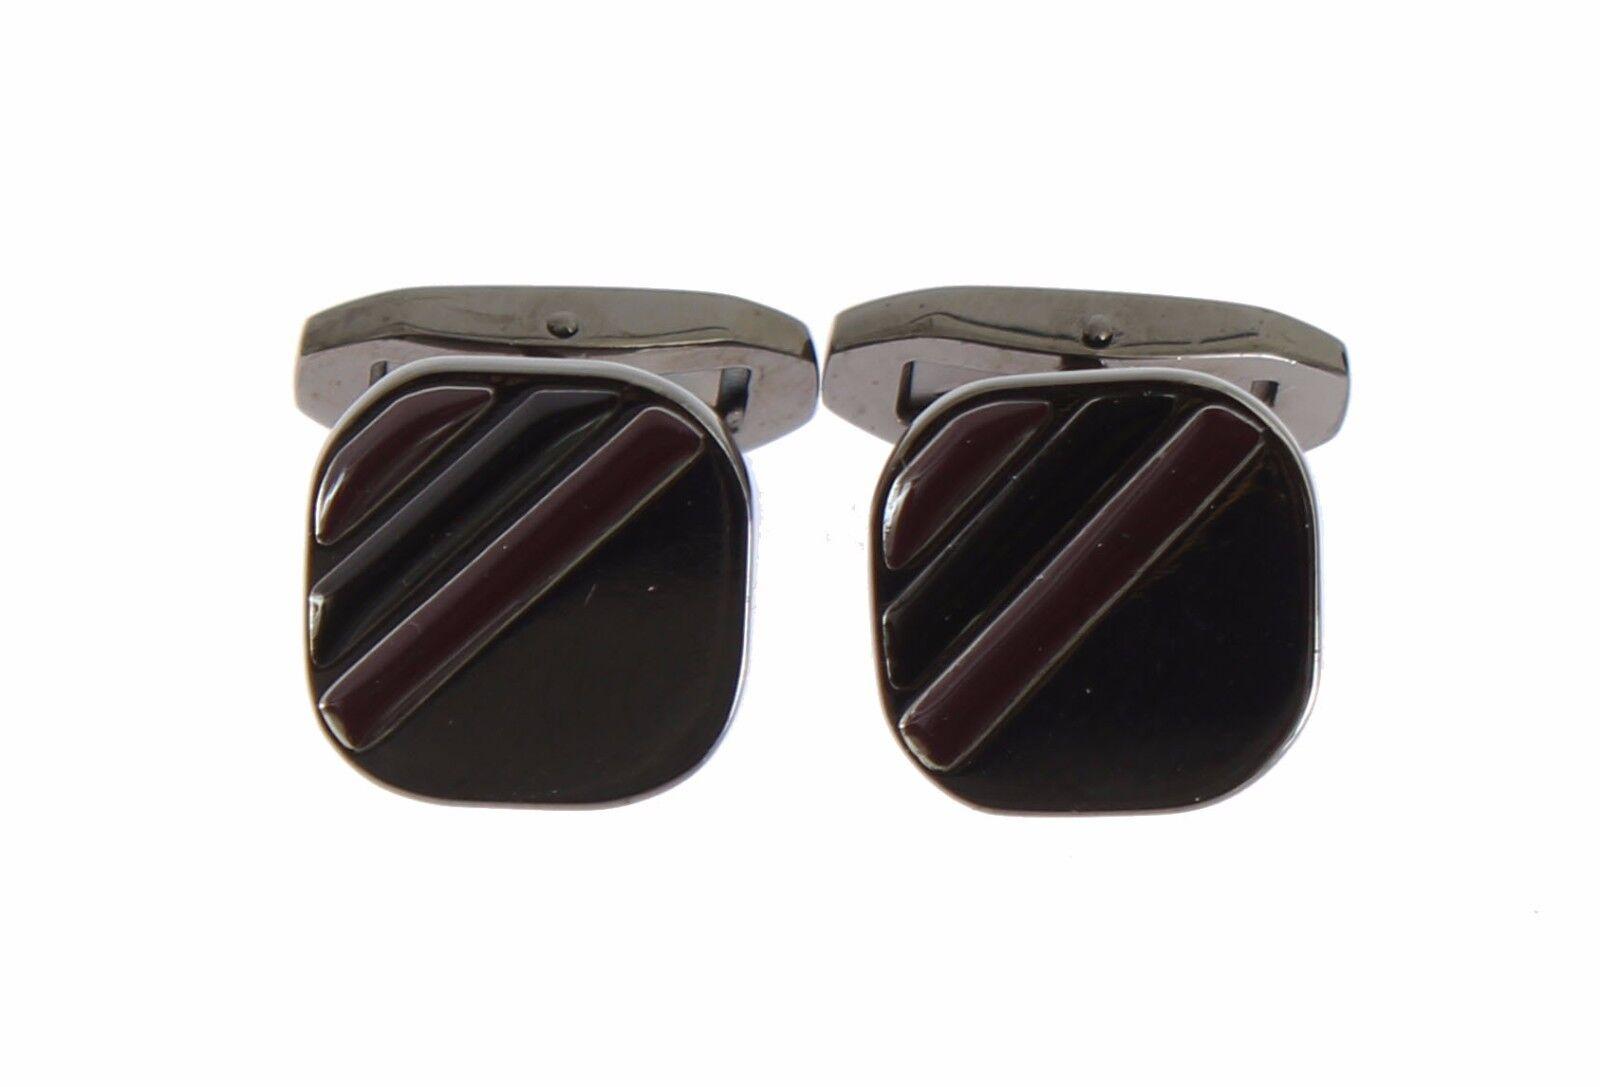 NEW $240 DOLCE /& GABBANA Cufflink Silver Brass Black Red Stone Mens Accessory